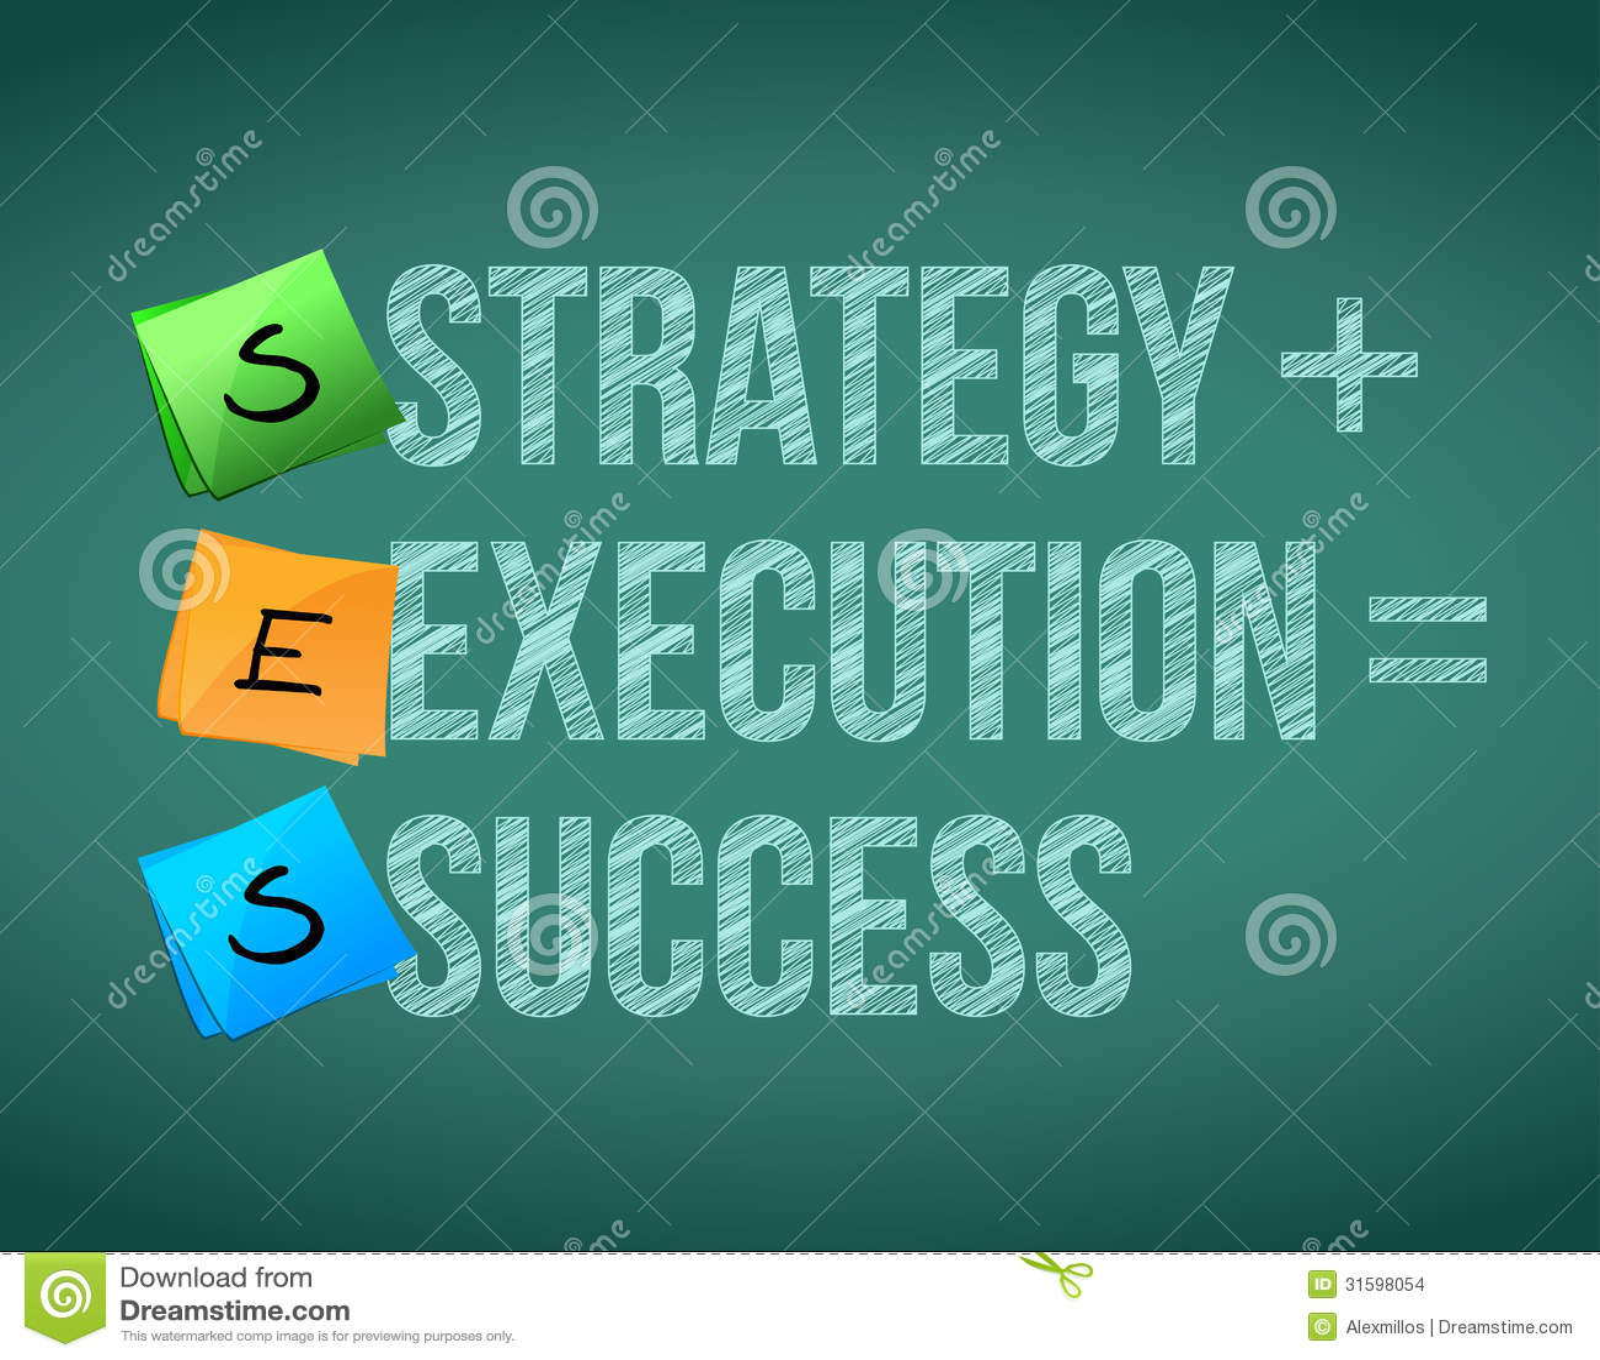 Essentials Guide to Strategic Planning